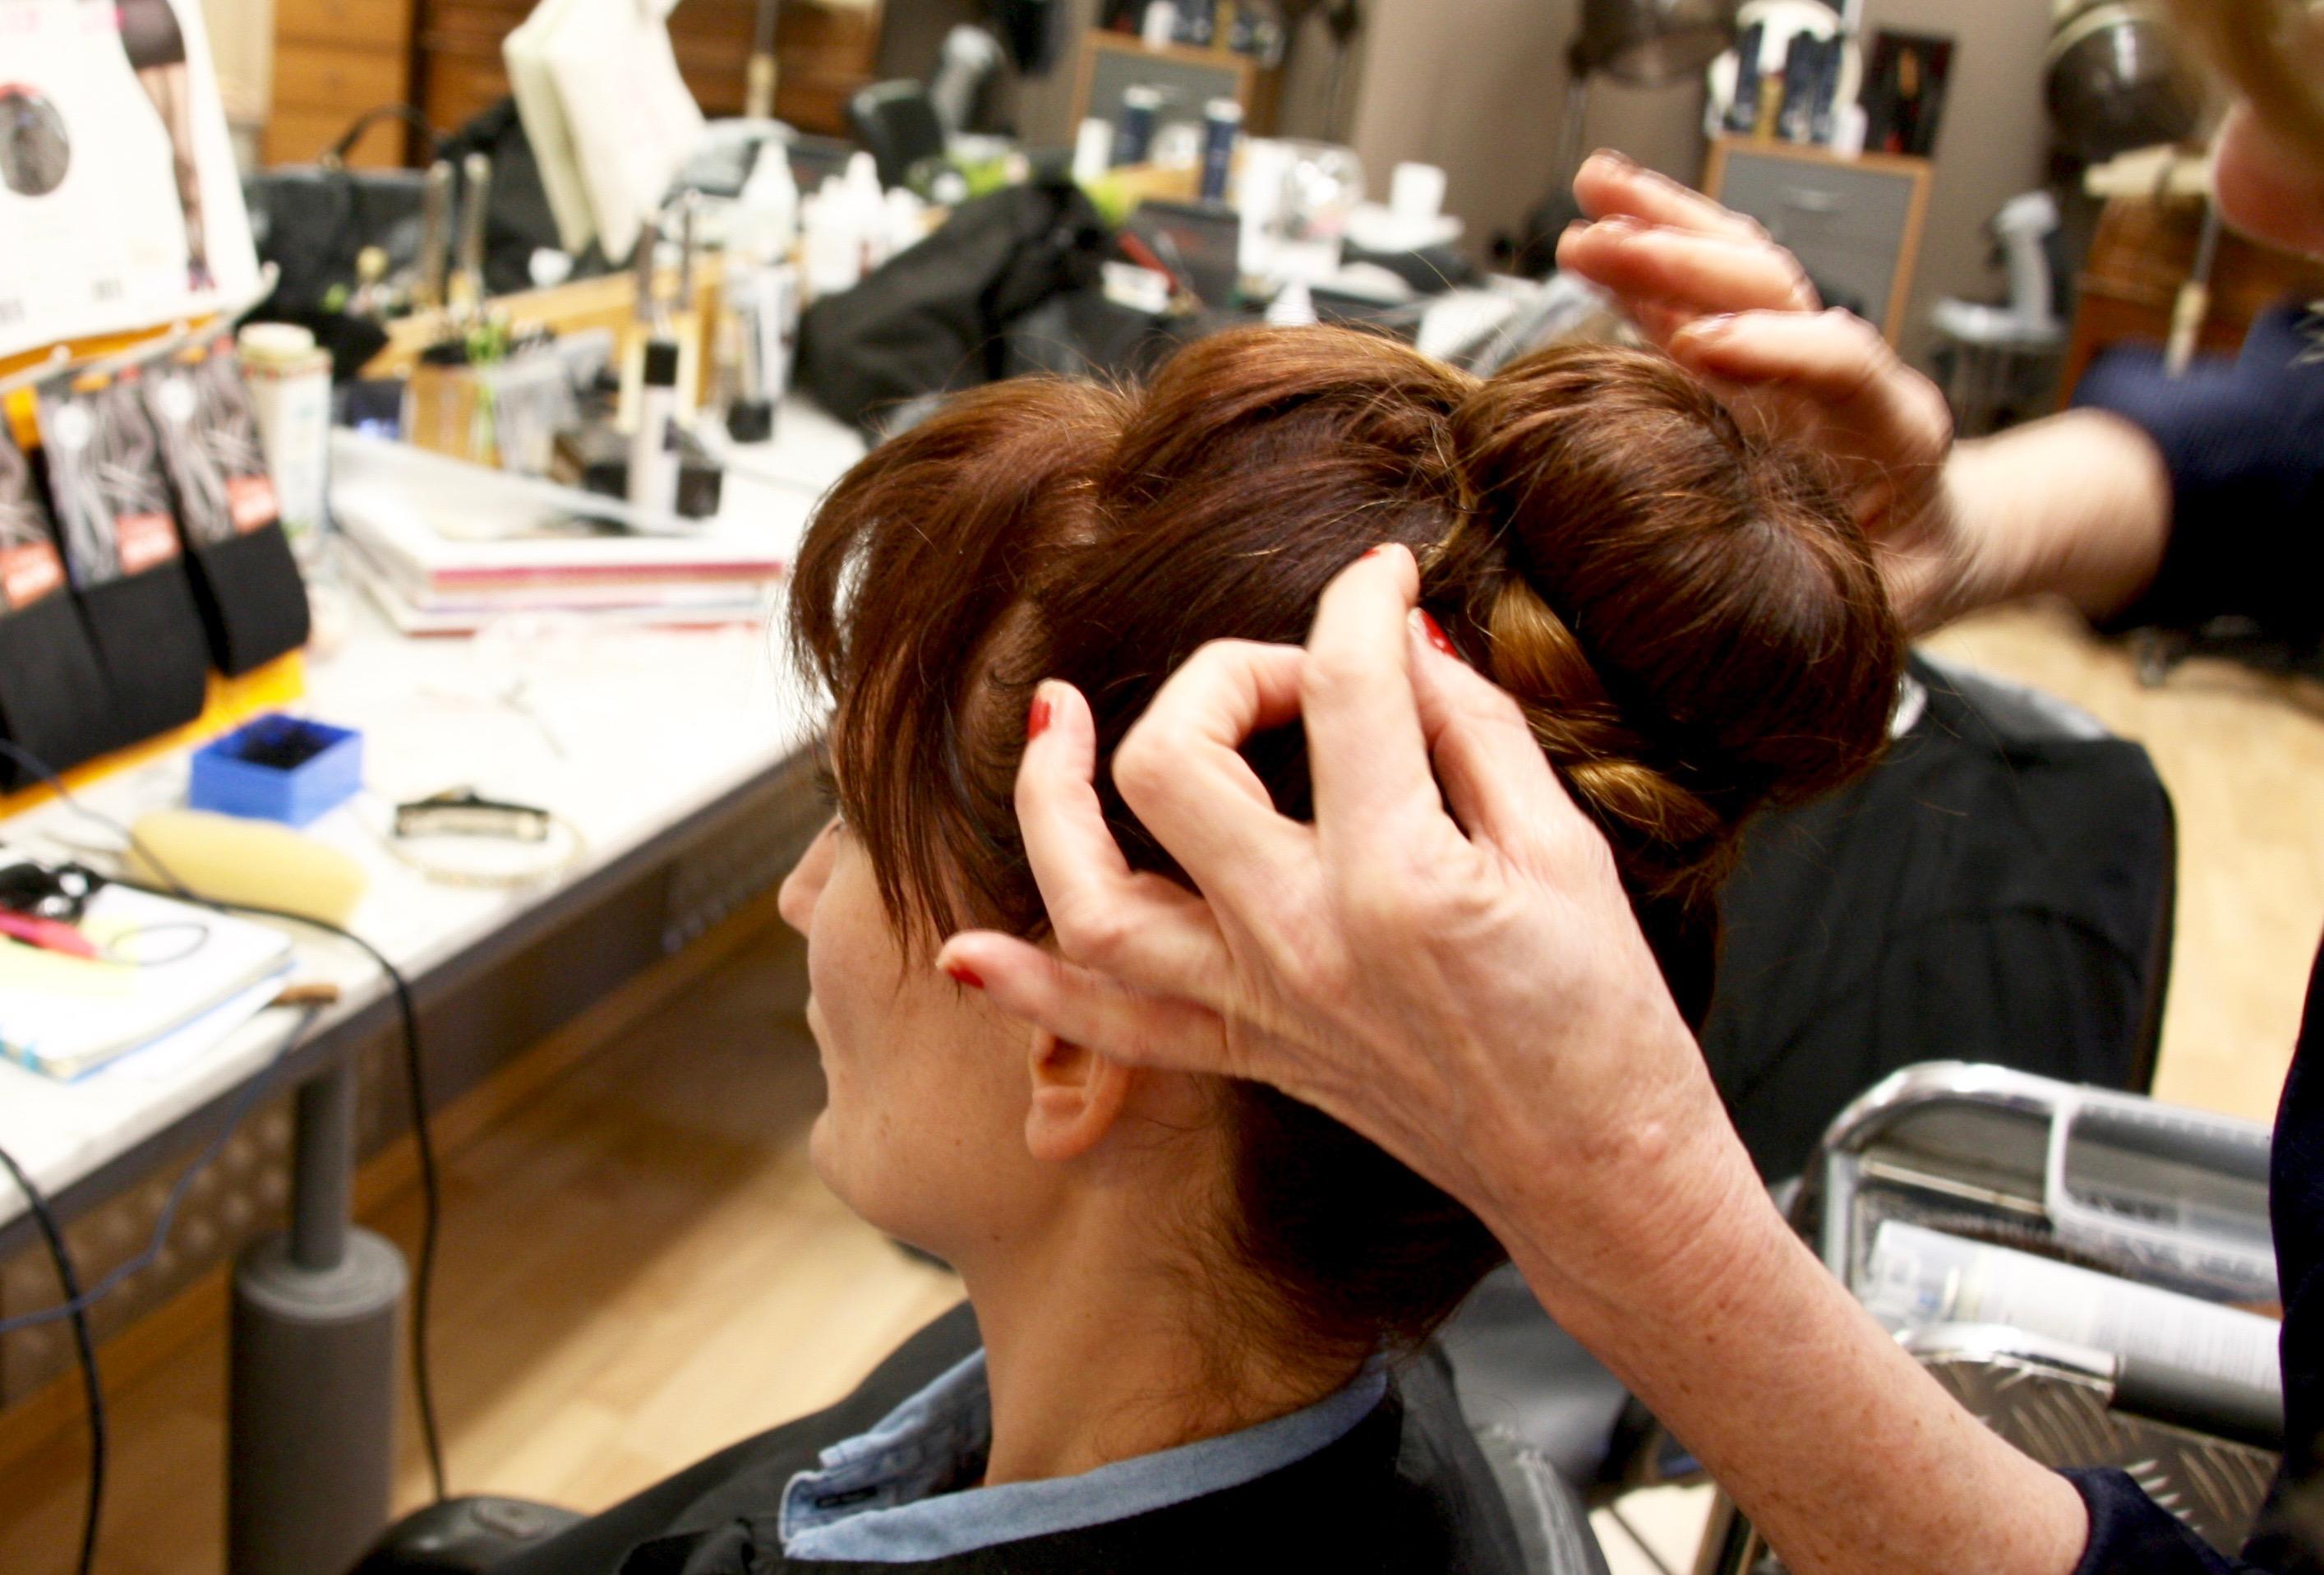 Hollywood Make-over Kapsalon Voque Bal Rat Mort Audrey Hepburn Kursaal Oostende